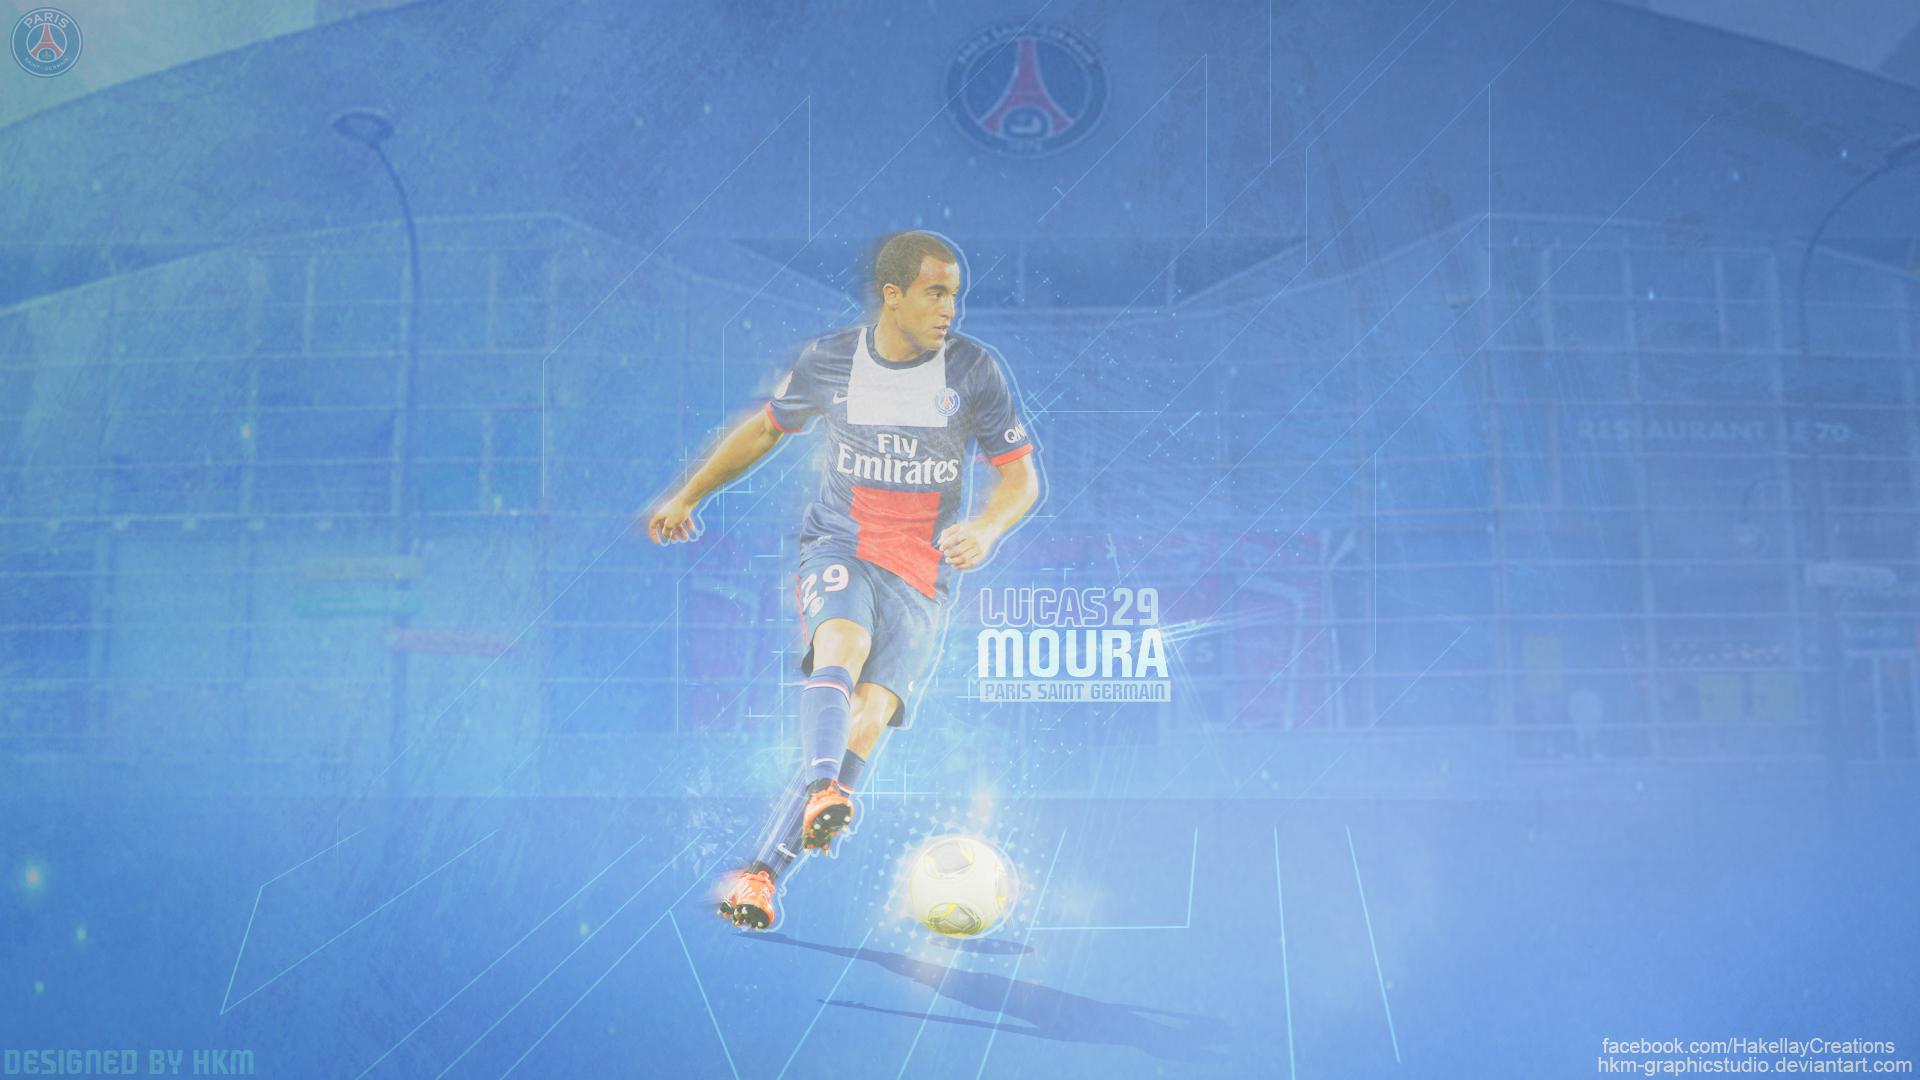 Lucas Moura PSG HDWallpaper--HkM By HkM-GraphicStudio On